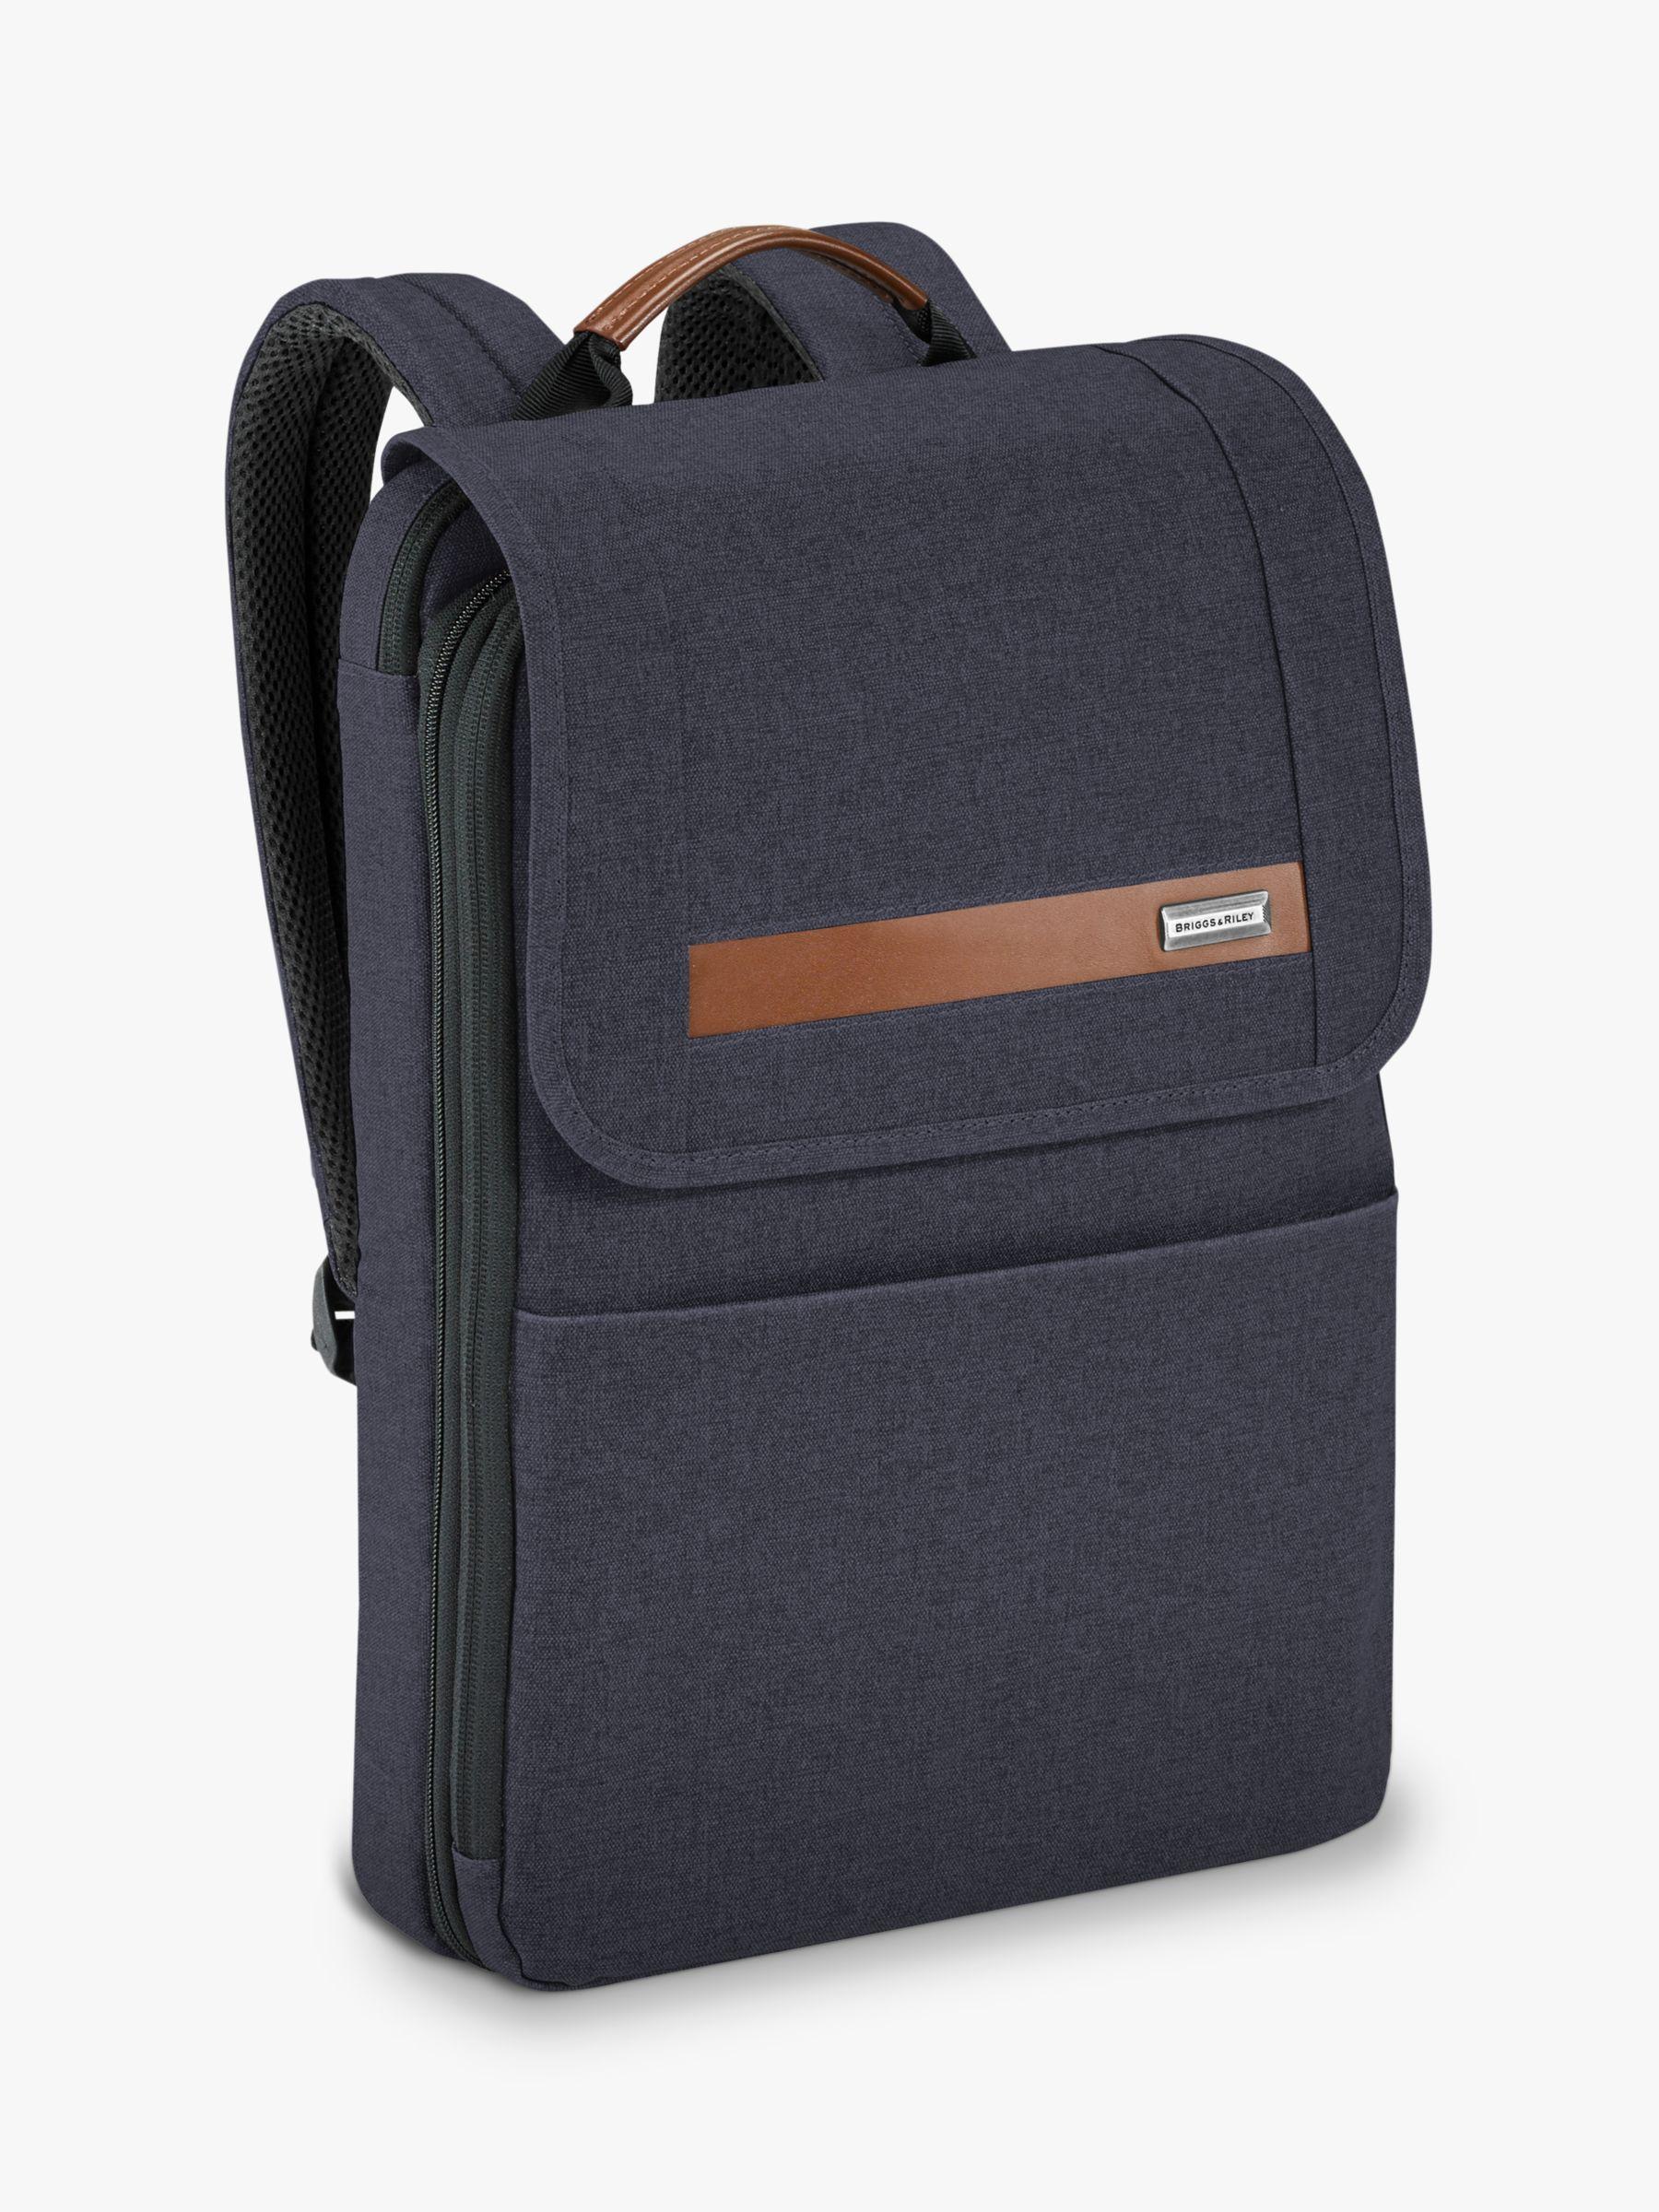 Briggs & Riley Briggs & Riley Kinzie Street 2.0 Slim Flapover Expandable Backpack